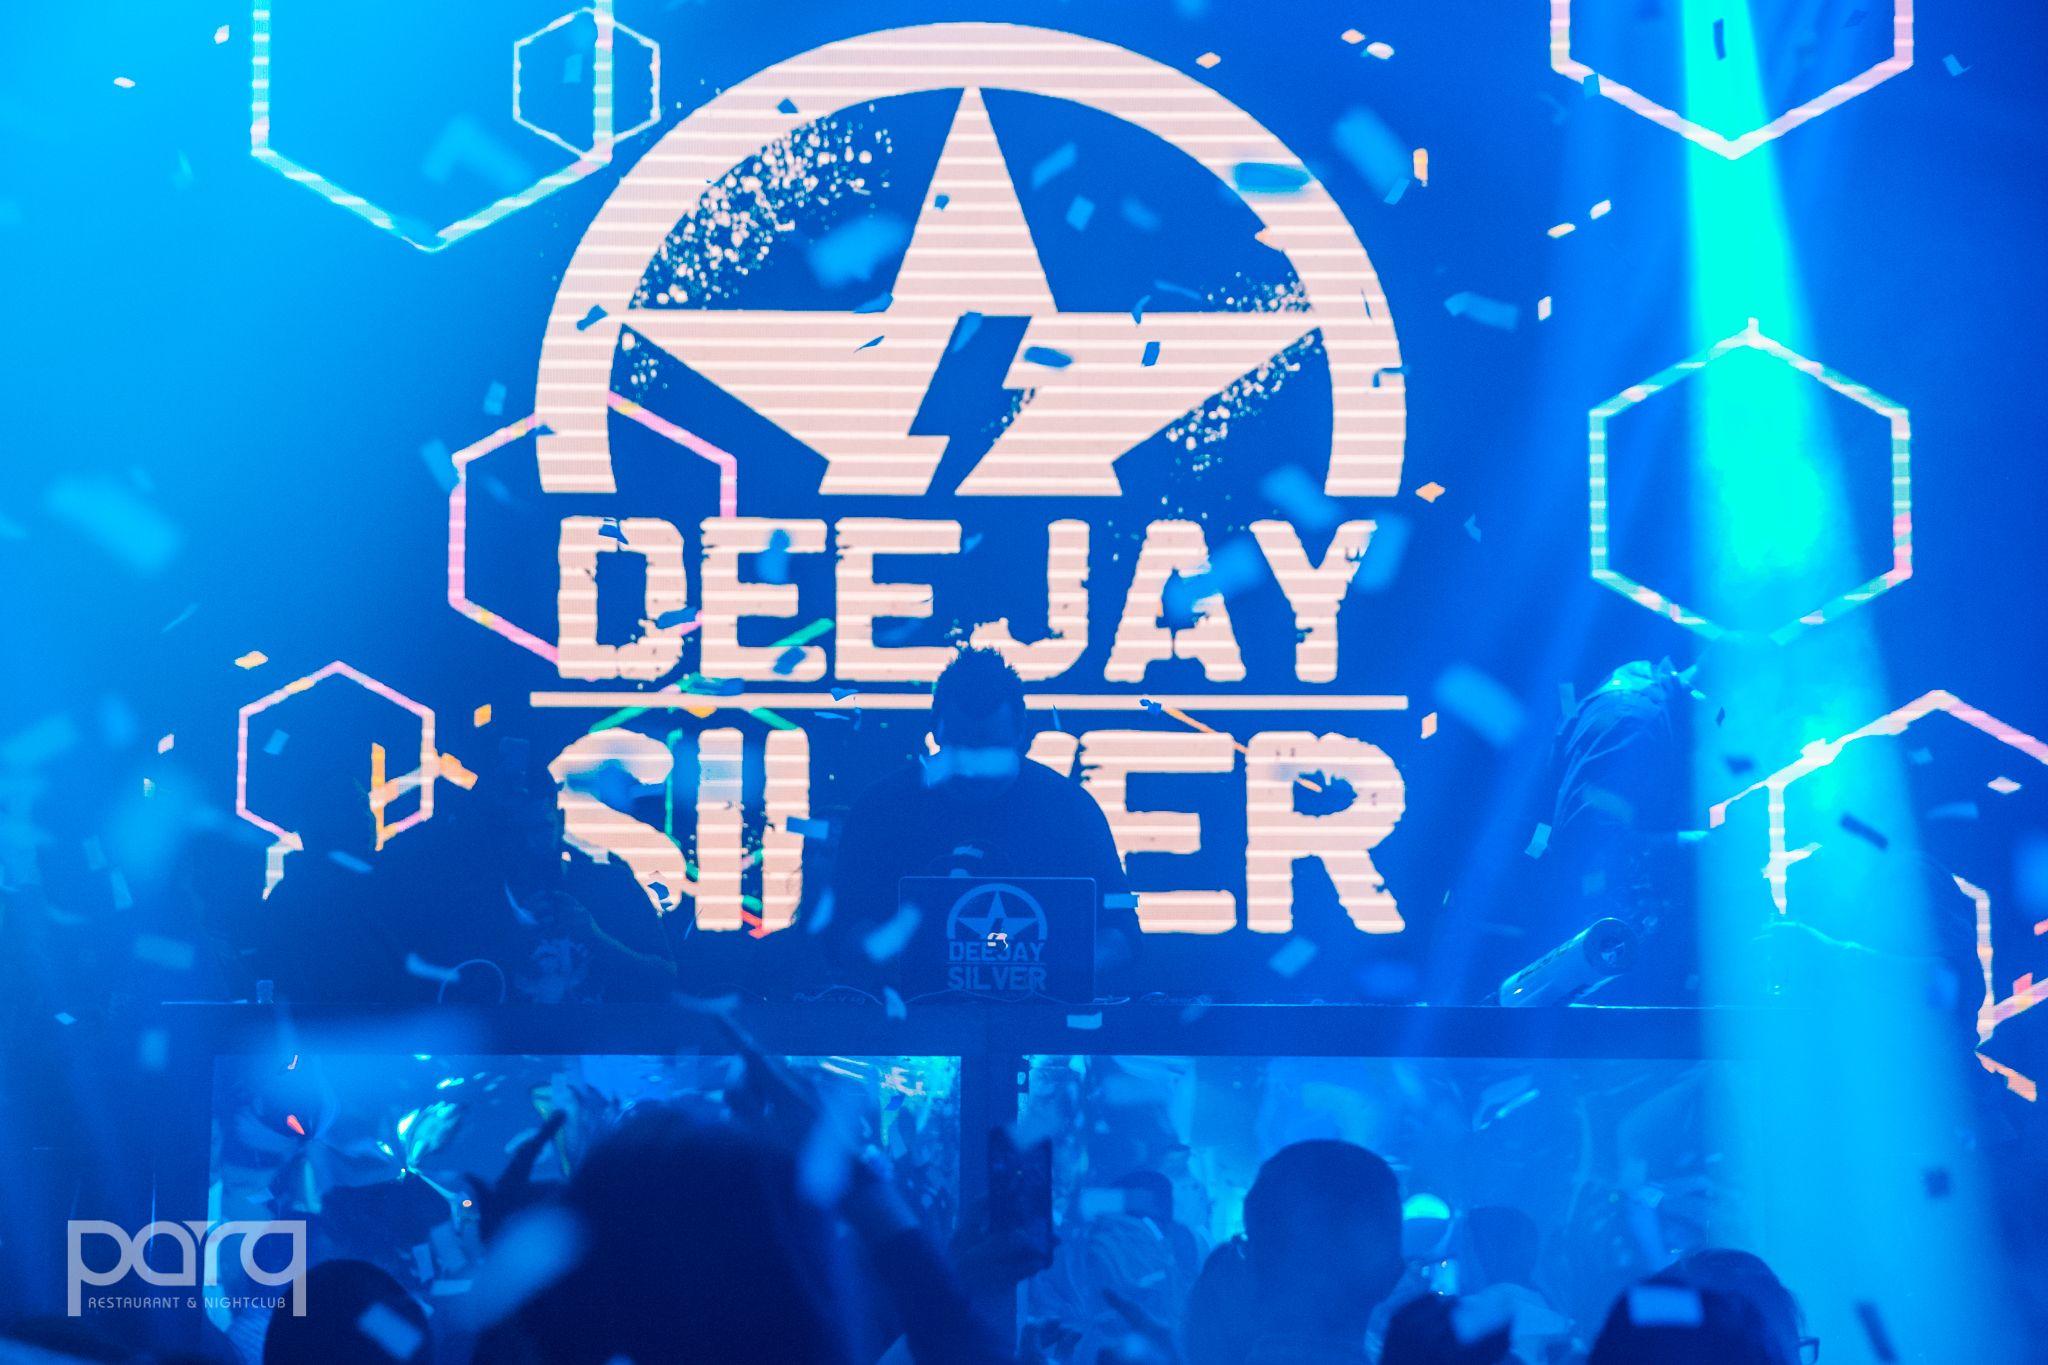 04.21.18 Parq - Deejay Silver-21.jpg